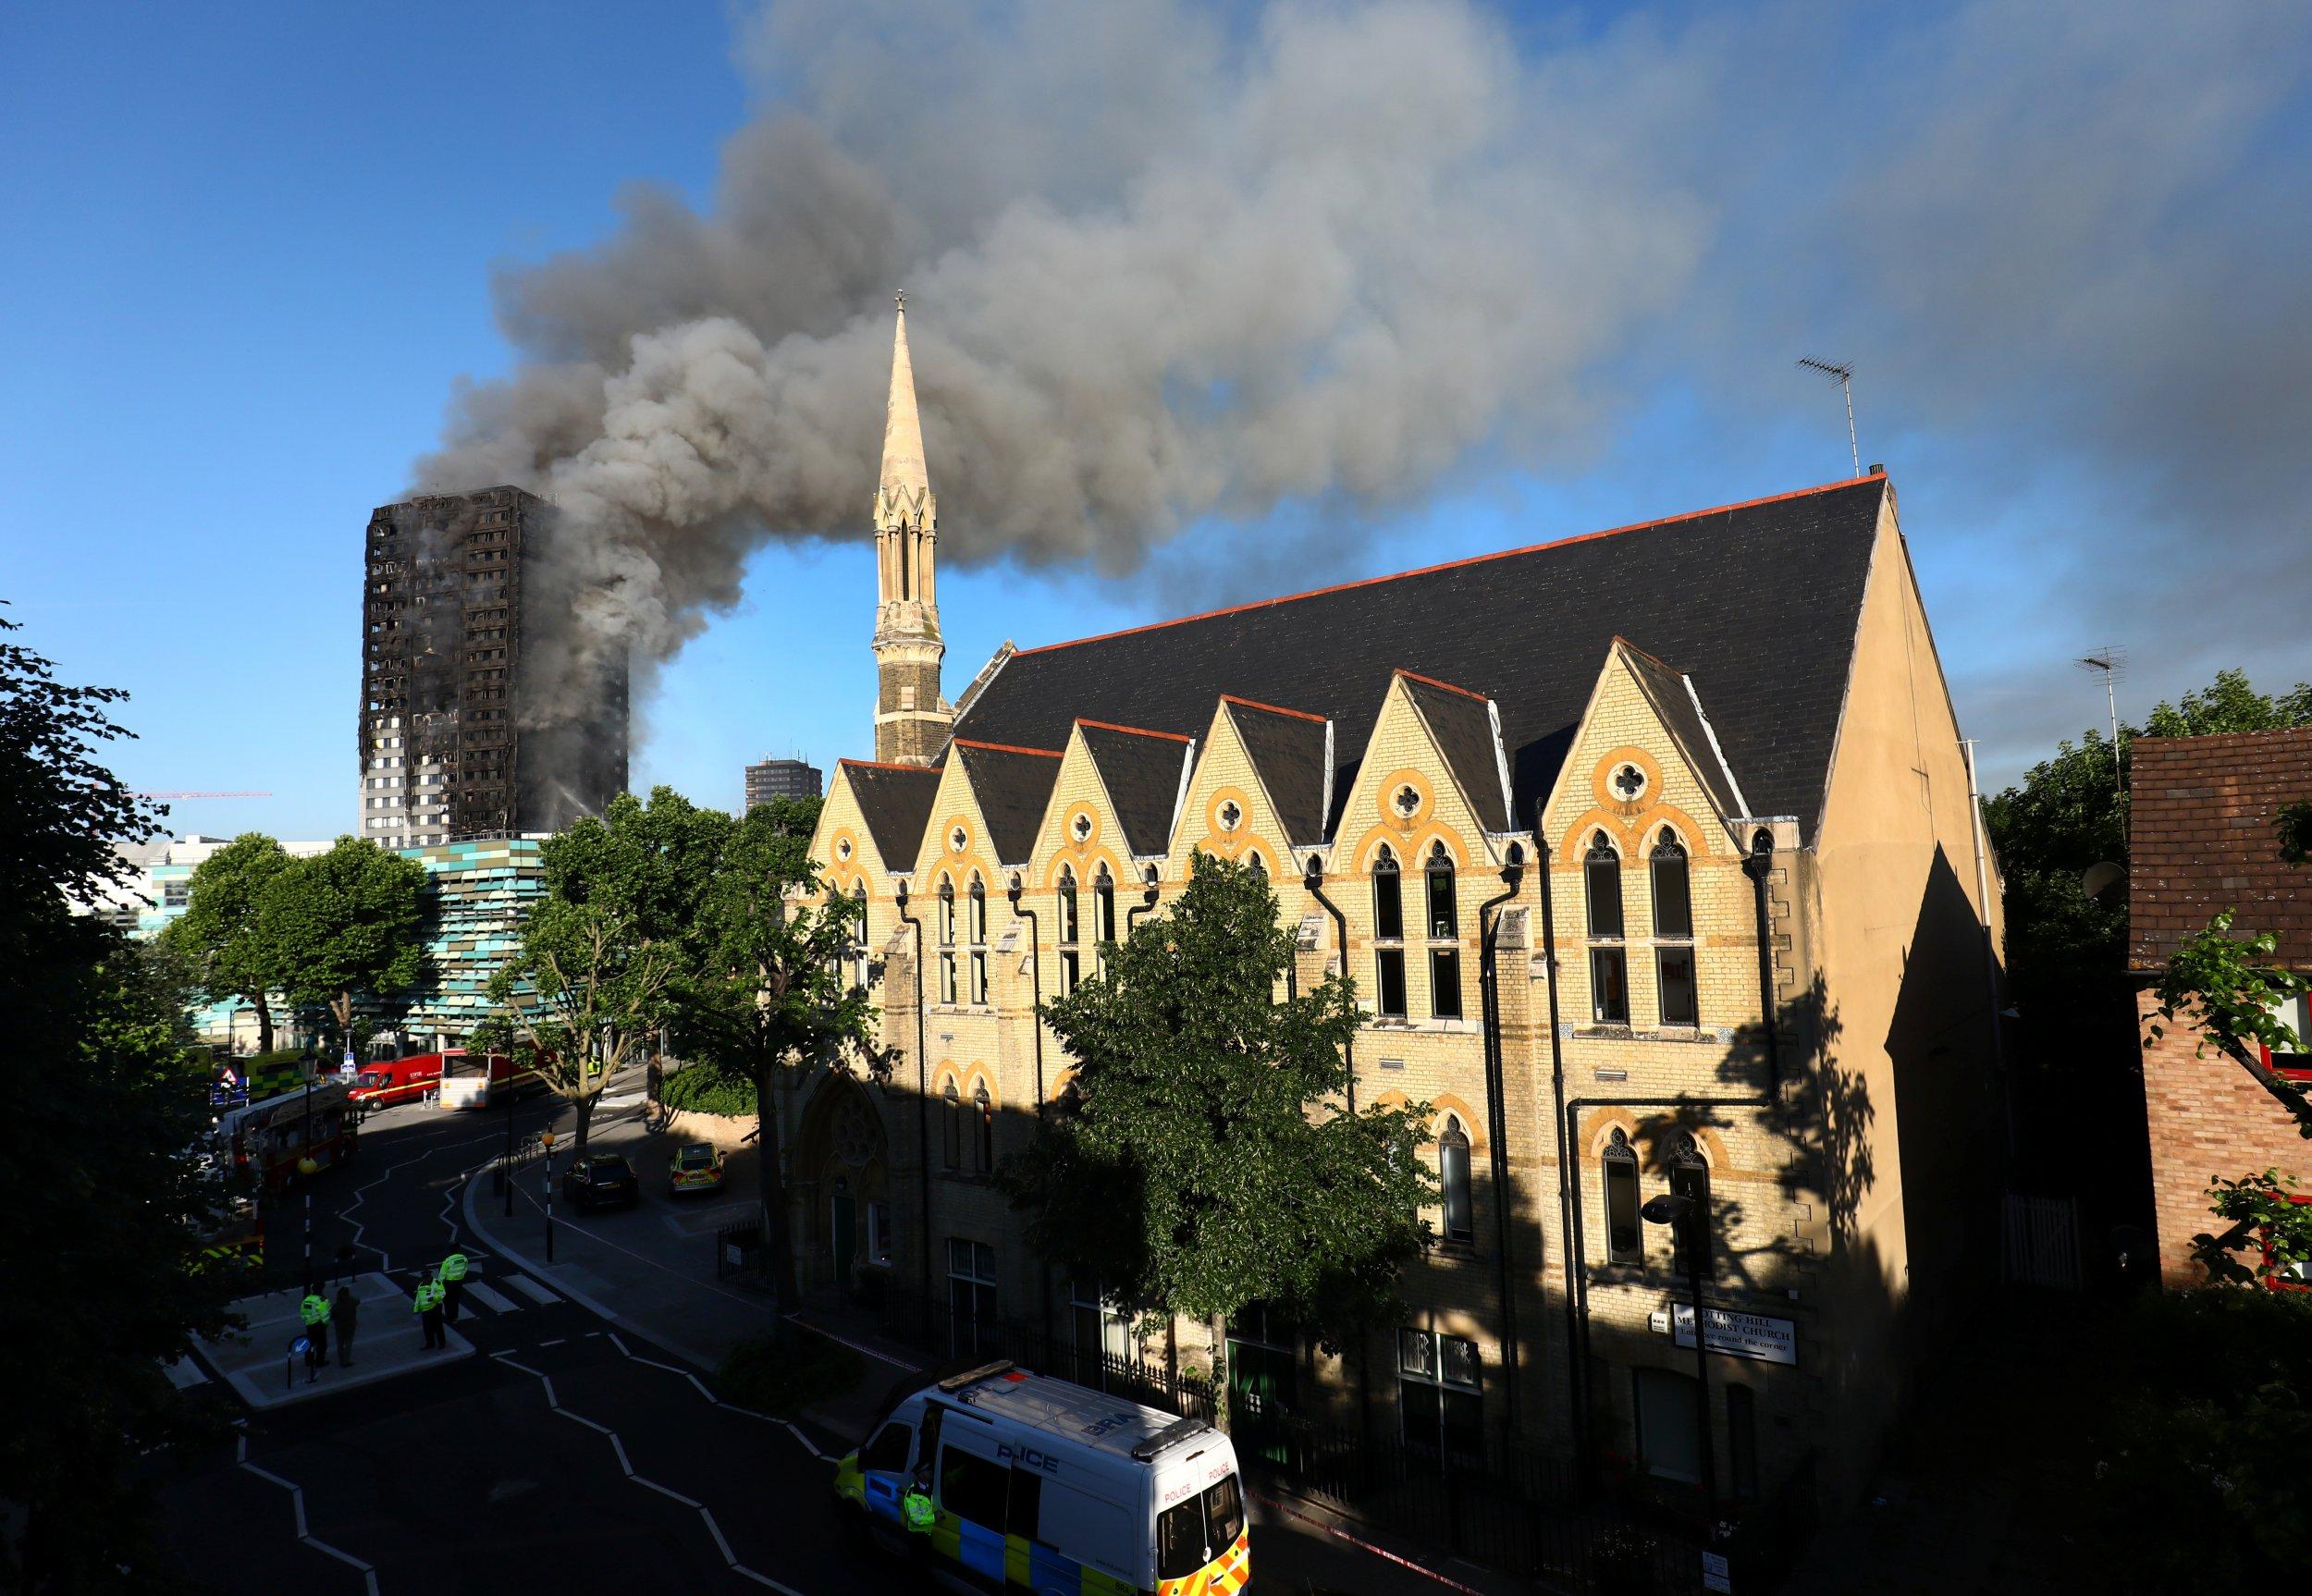 London Tower Block Fire